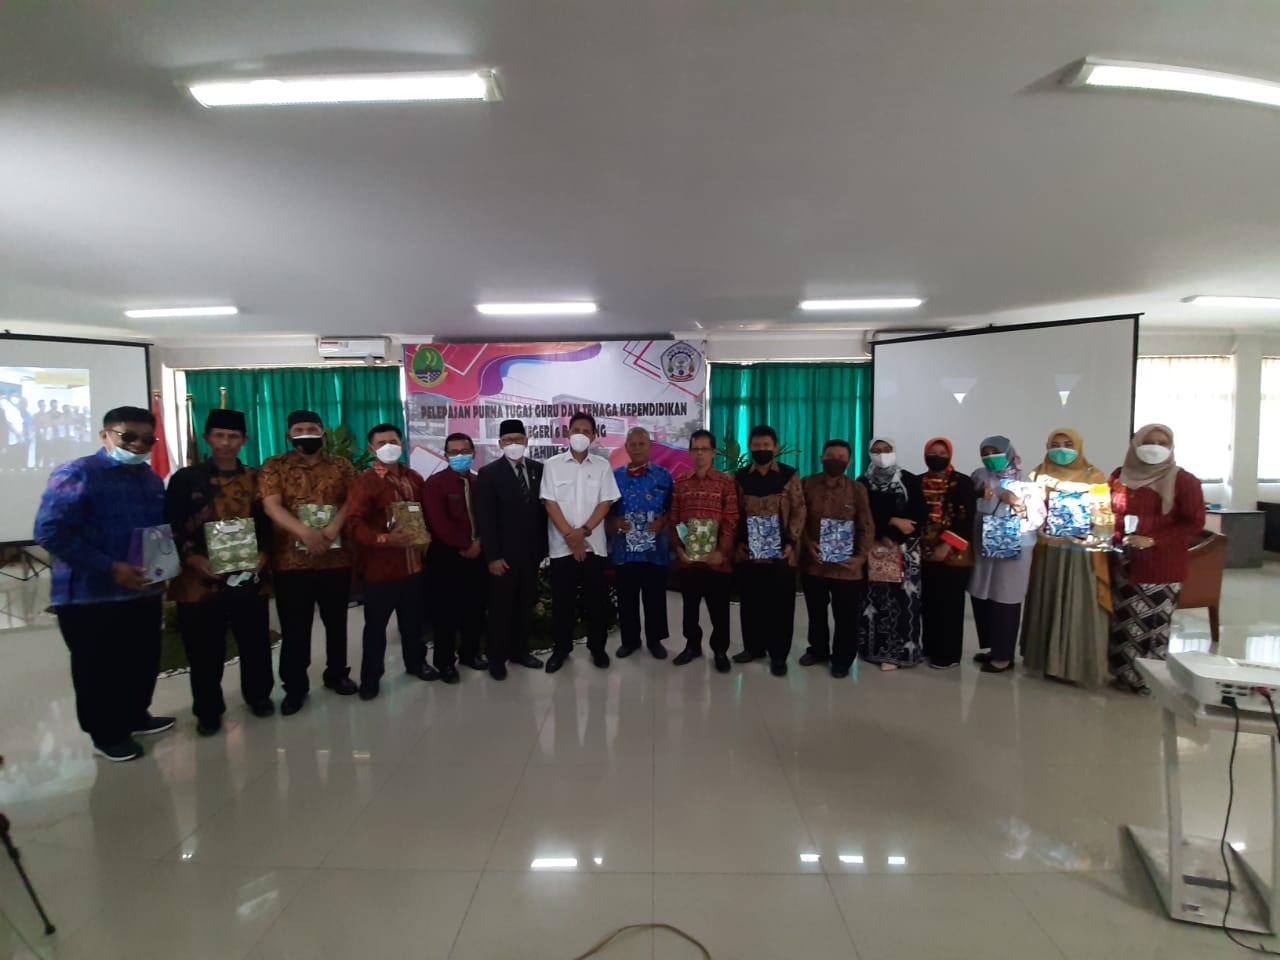 Pelepasan Purna Tugas Guru SMKN 6 Bandung